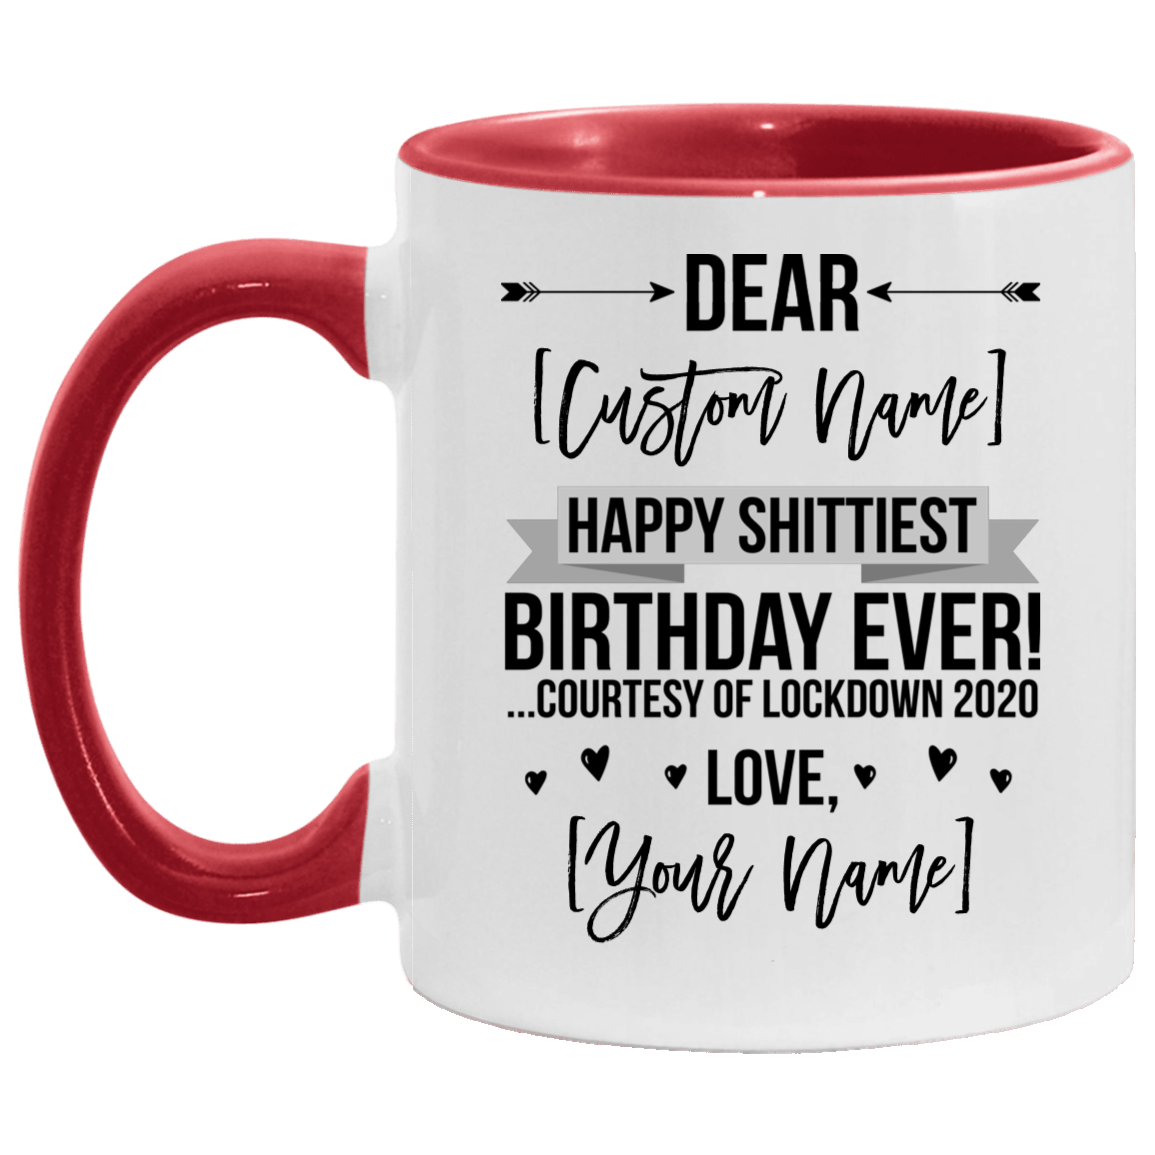 Personalized Lockdown Birthday Mug